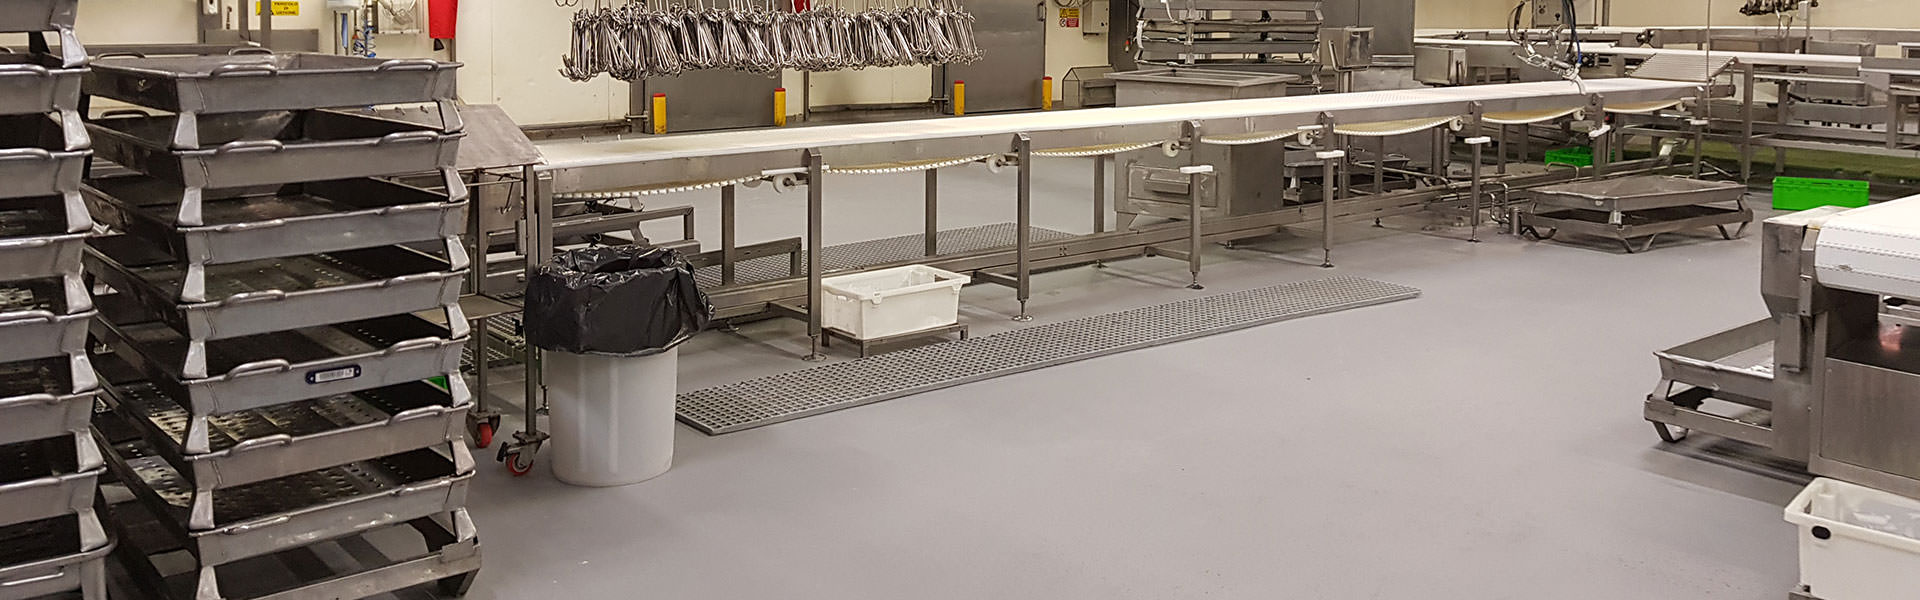 Pavimenti in resina per industrie alimentari